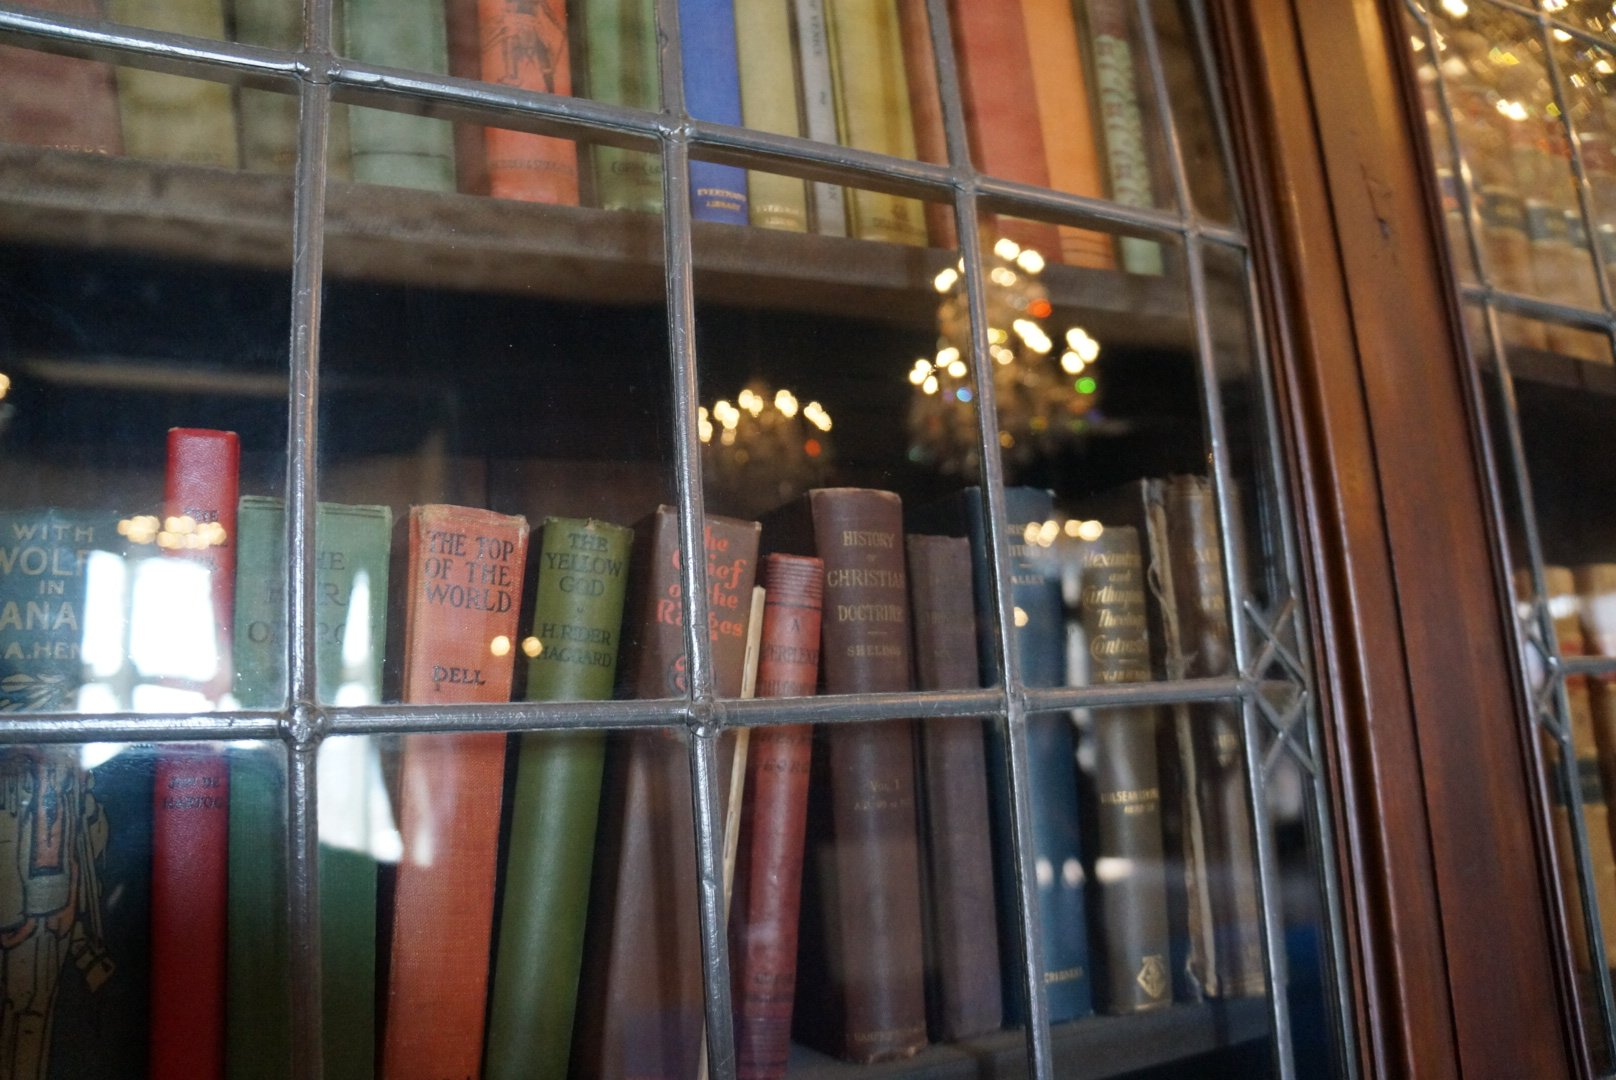 Casa Loma - books